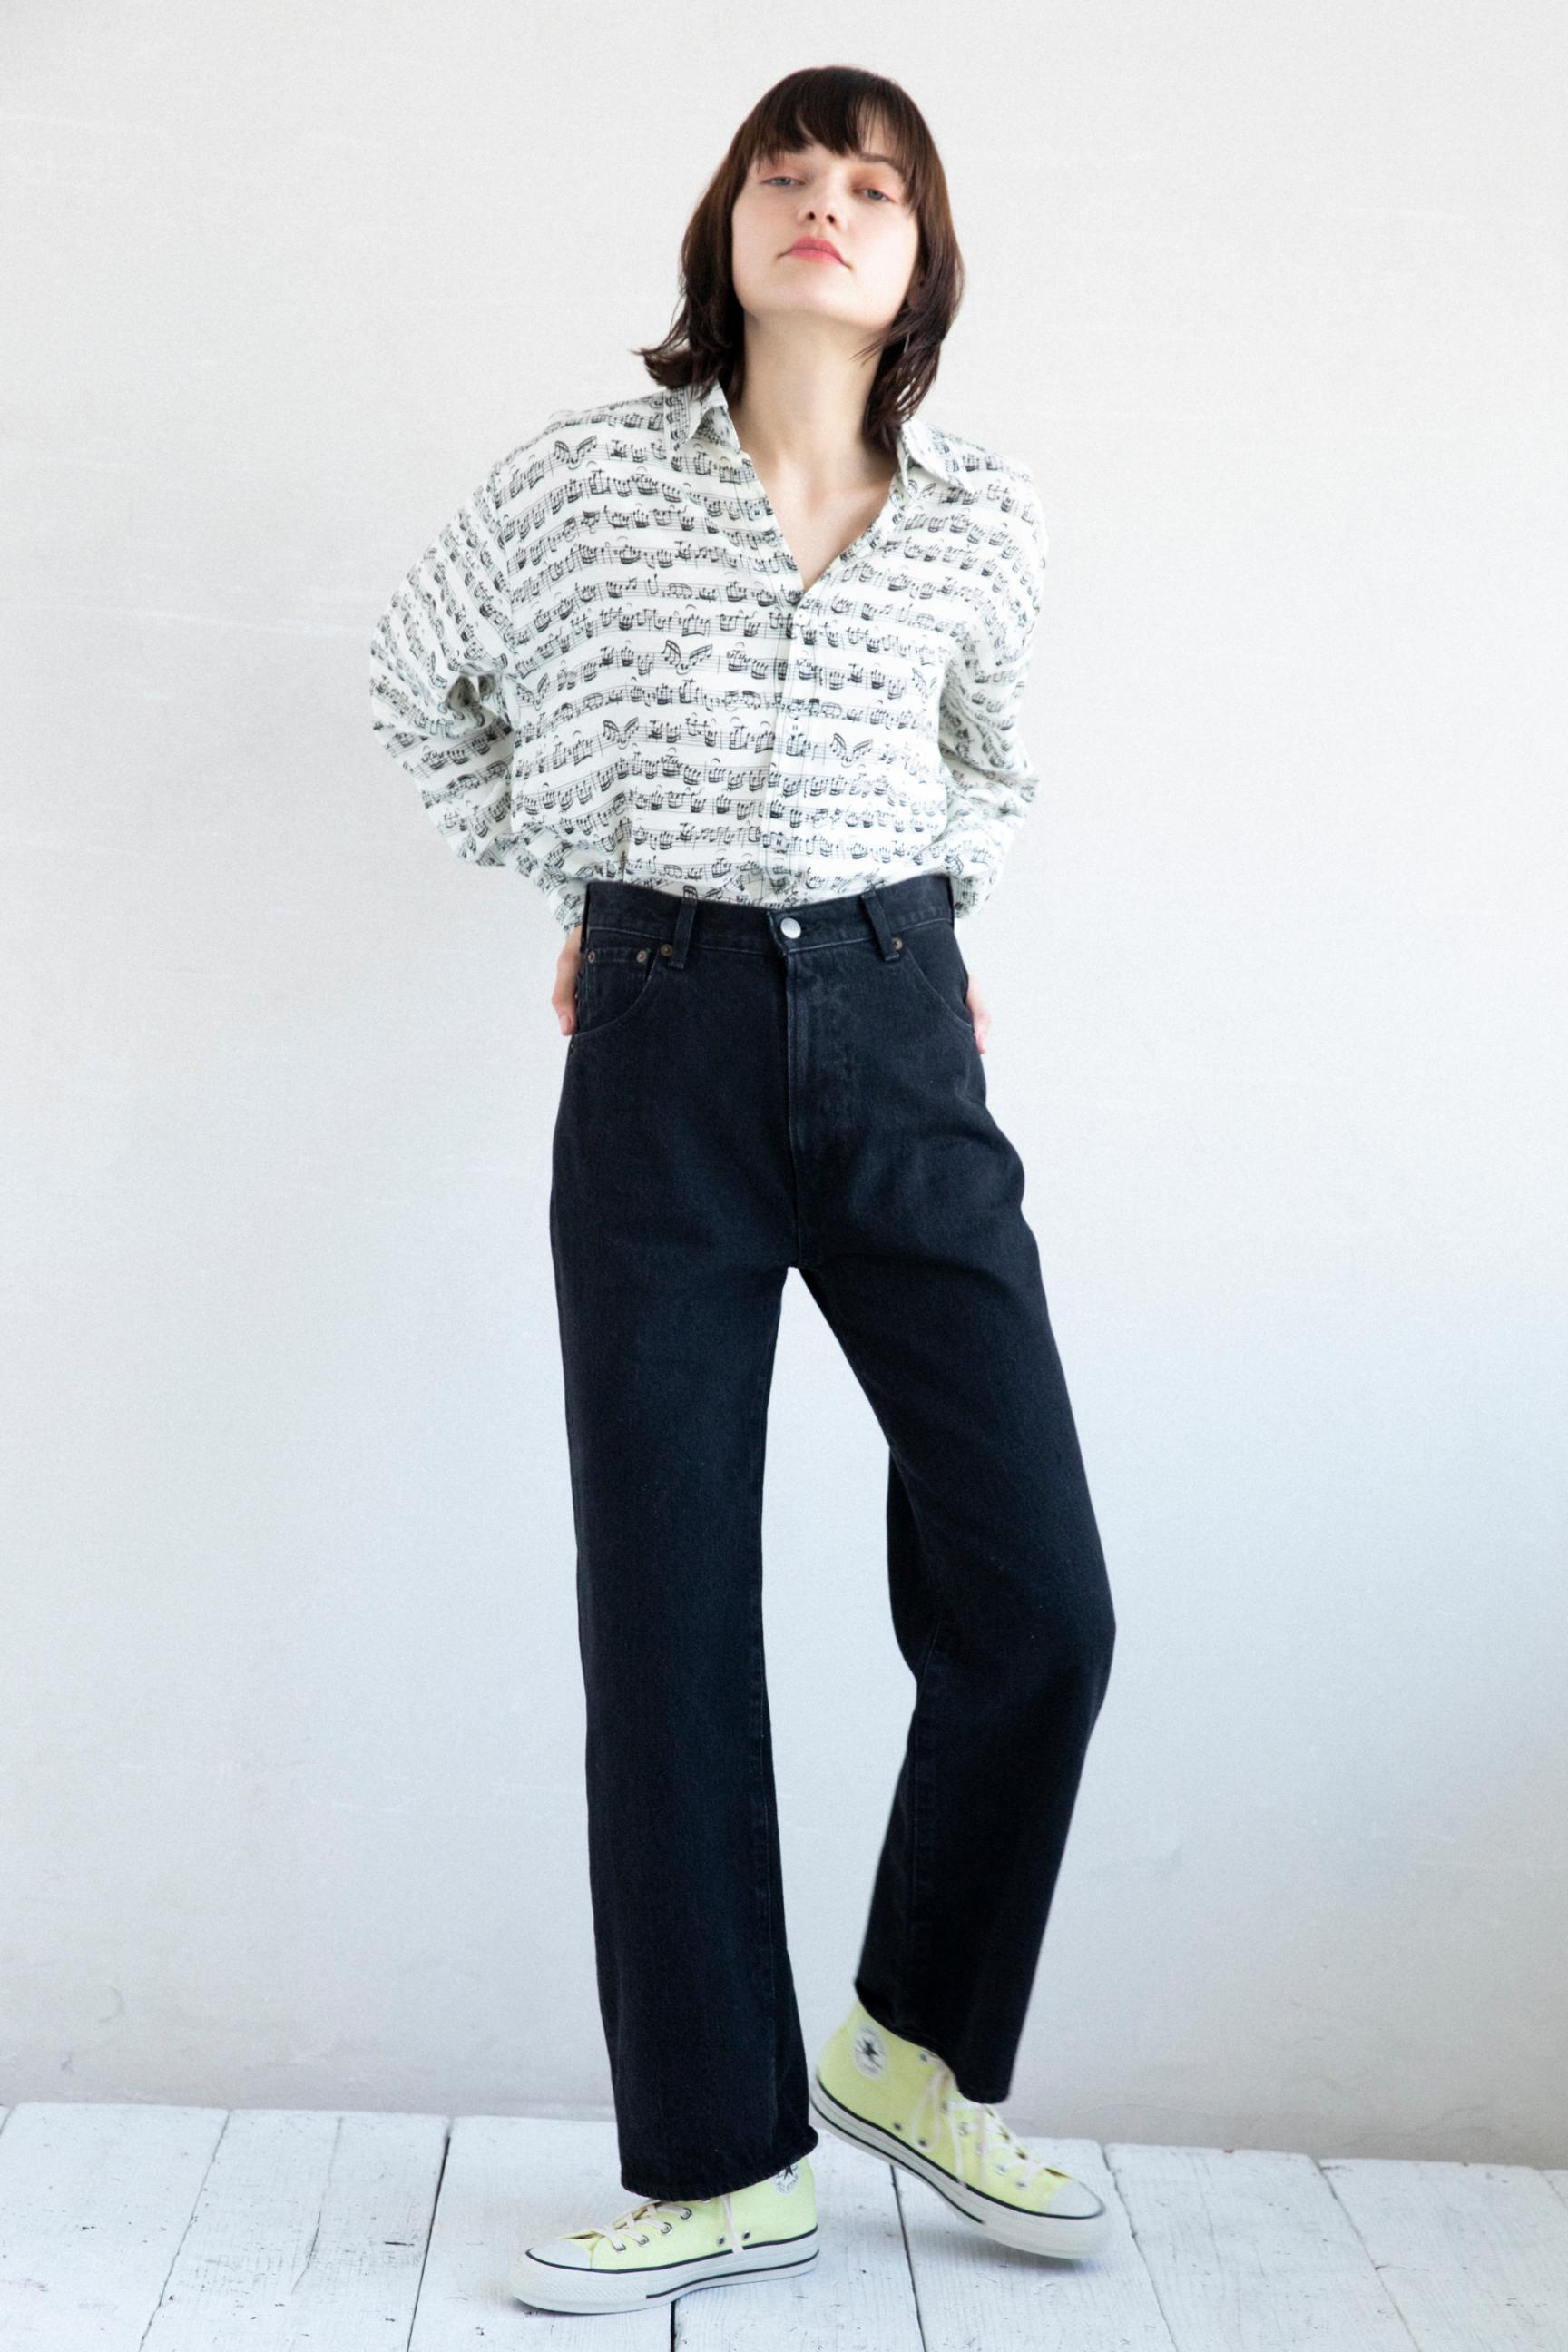 38_2 shirt¥31,900 pants¥23,100 shoes¥8,800